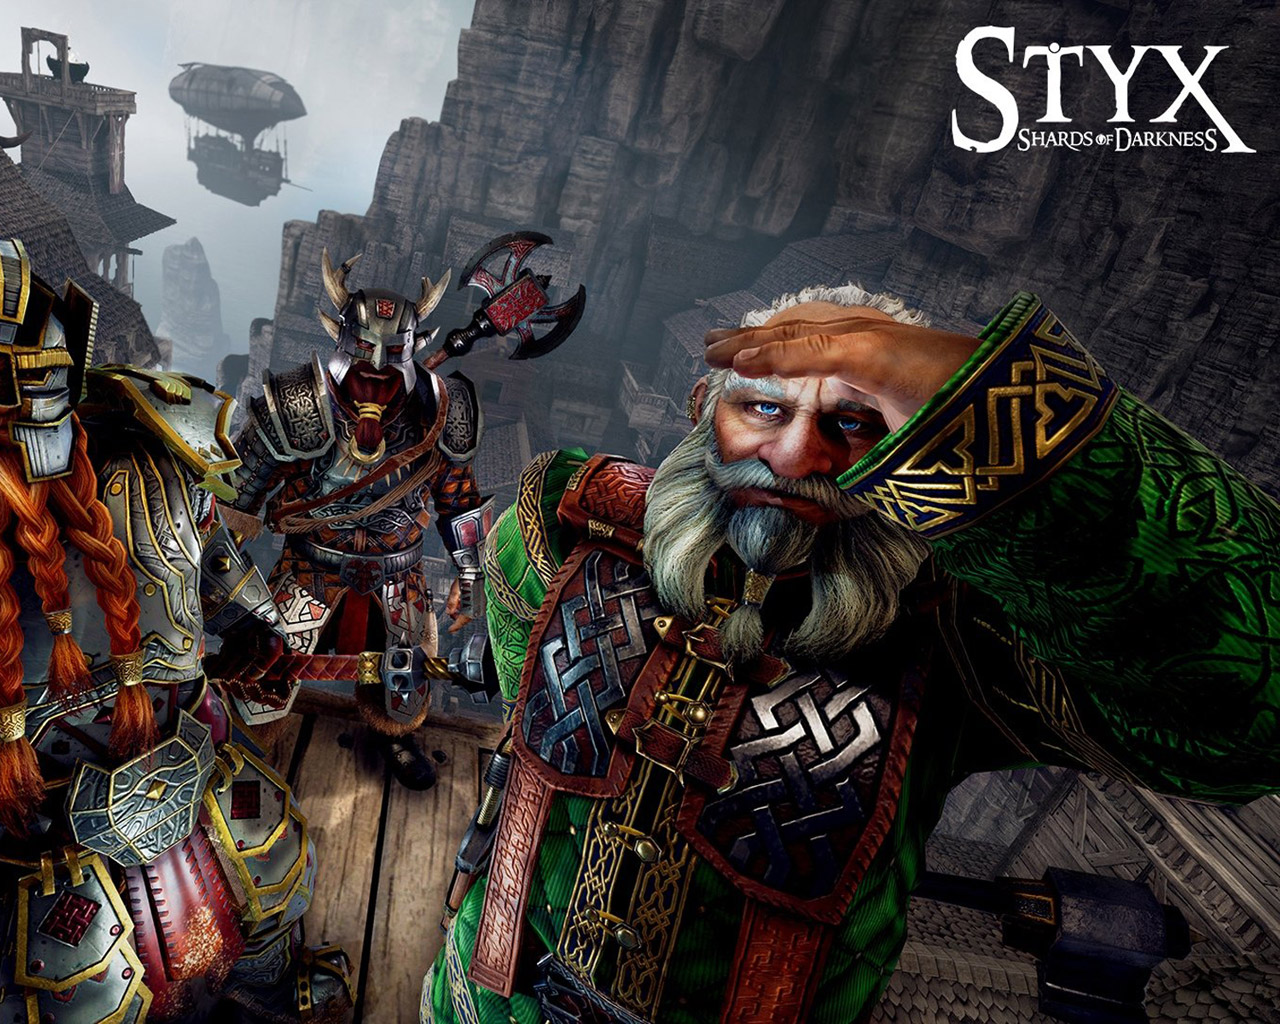 Styx: Shards of Darkness Wallpaper in 1280x1024